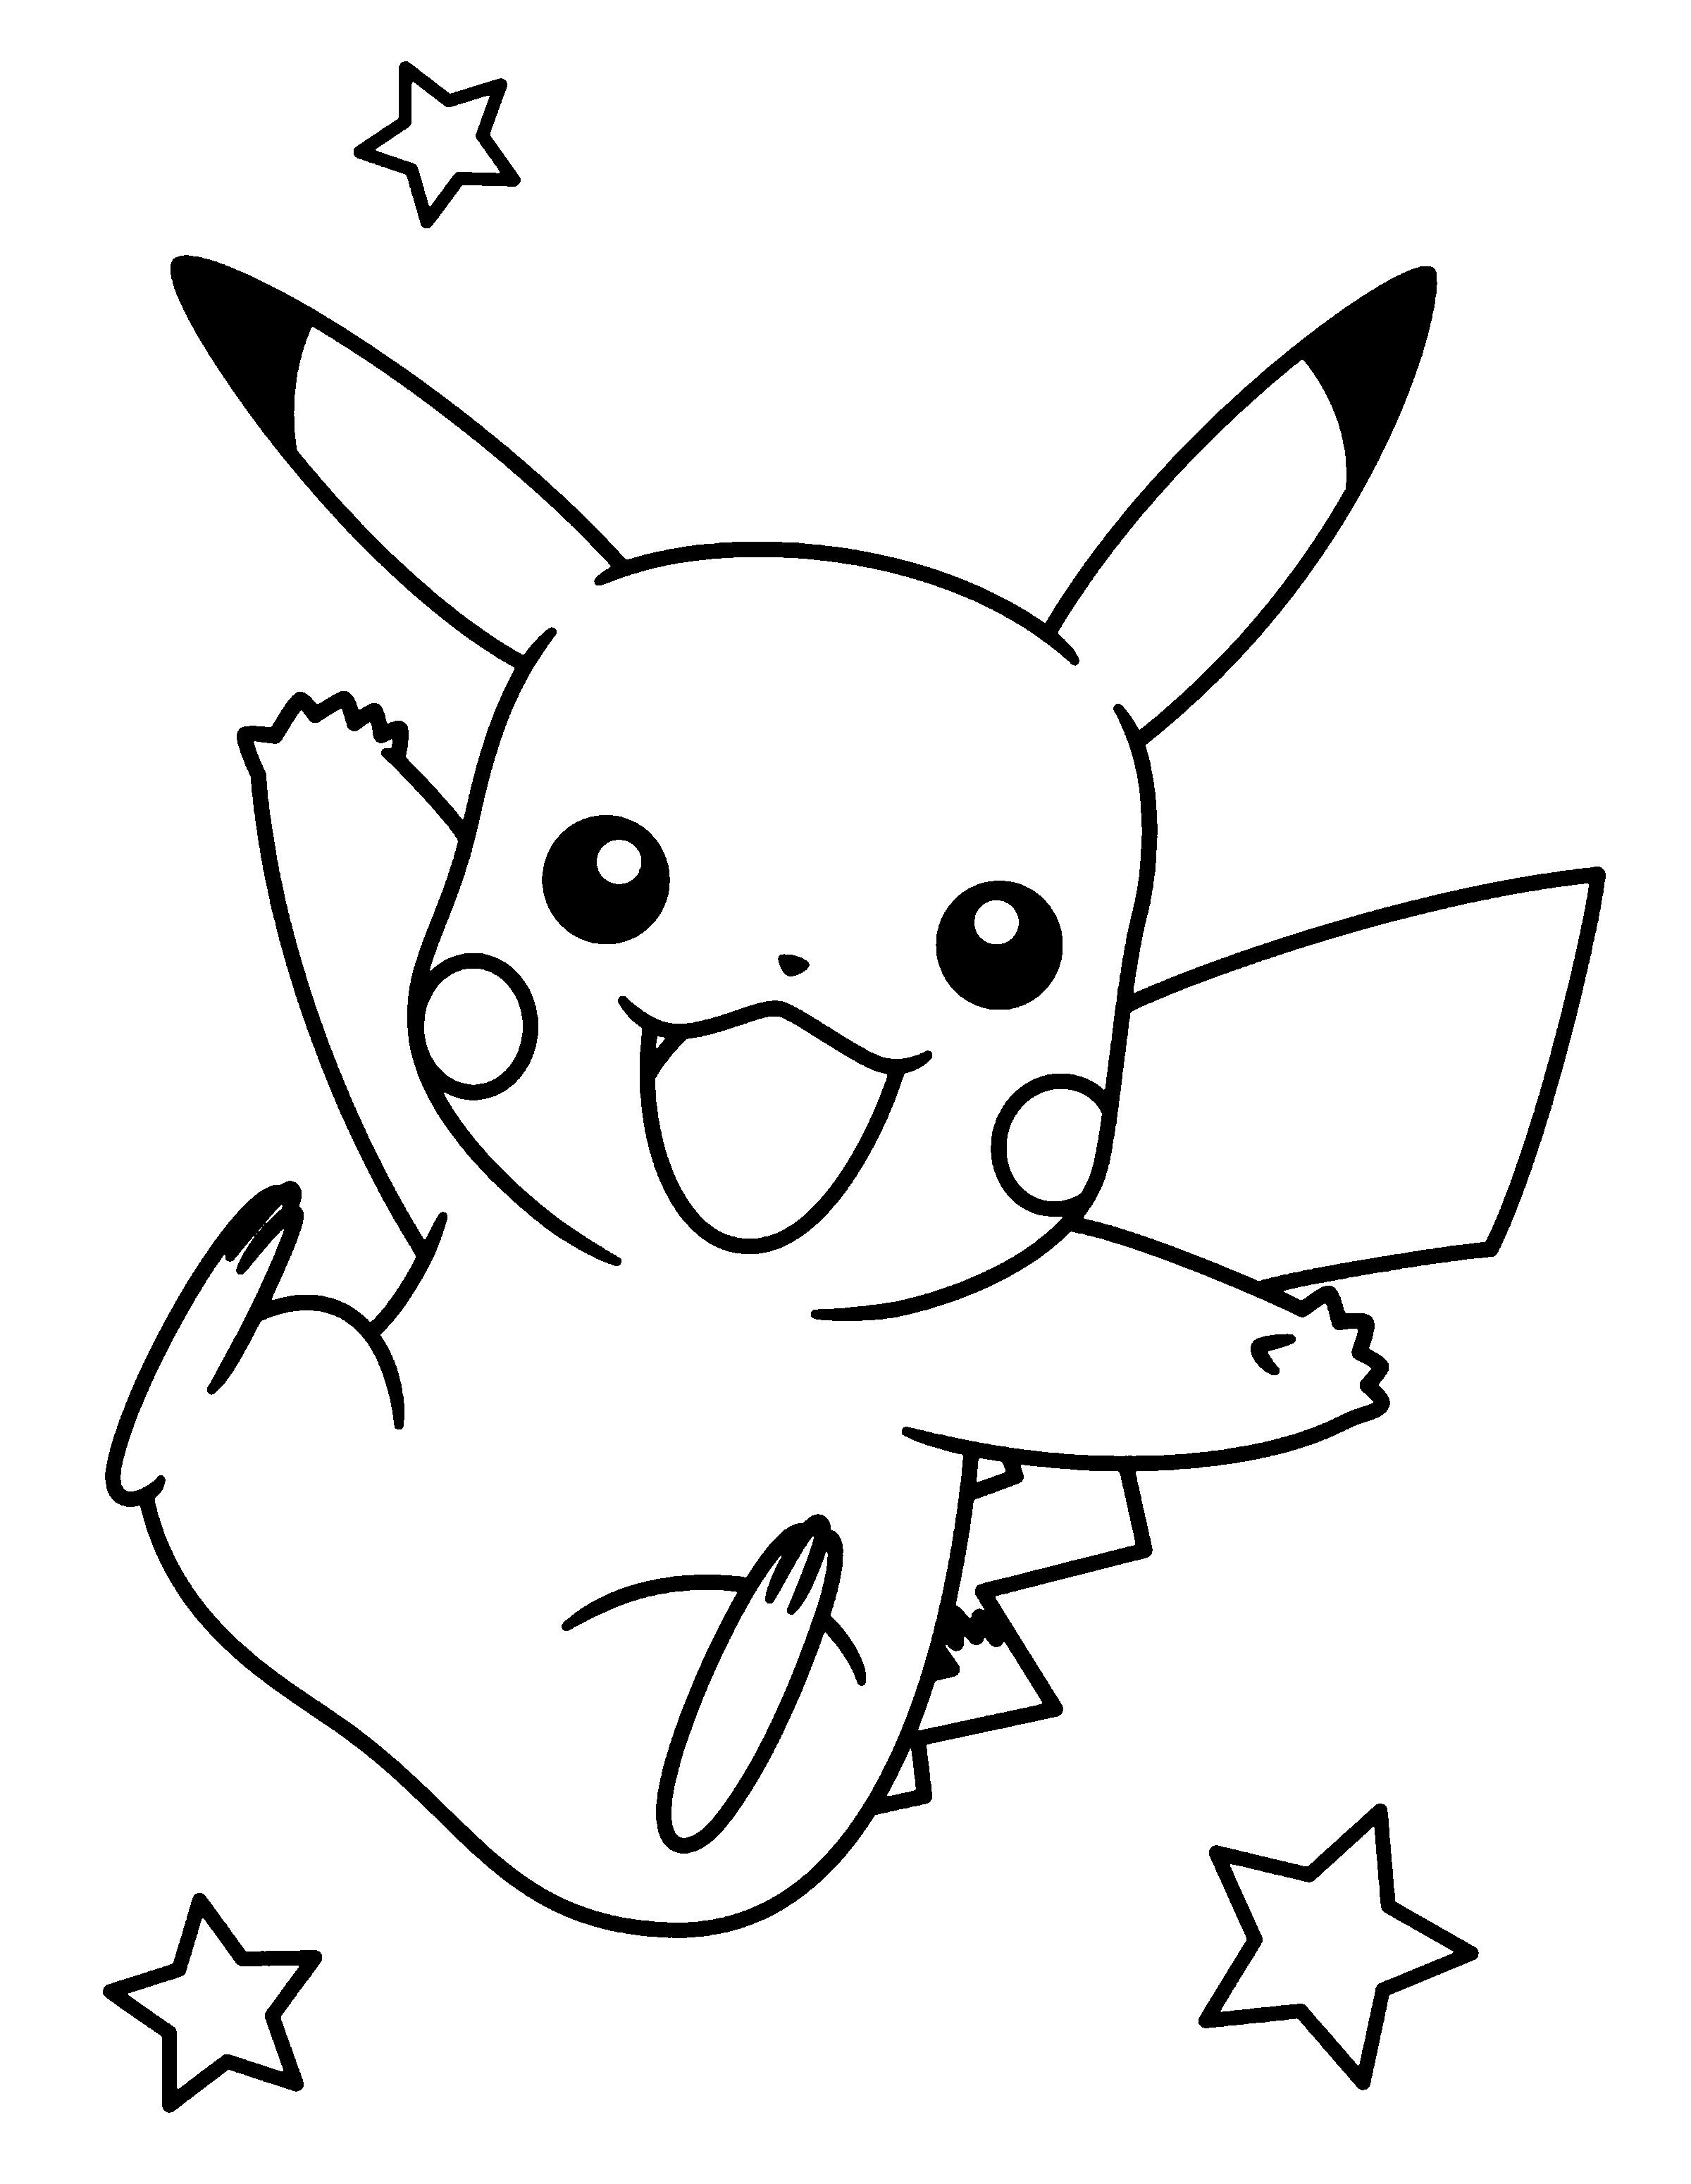 Pokemon diamond coloring pages - Pokemon Diamond Pearl Coloring Pages 65 Png 2400 3100 Pikachu Pinterest Coloring Pikachu And Search